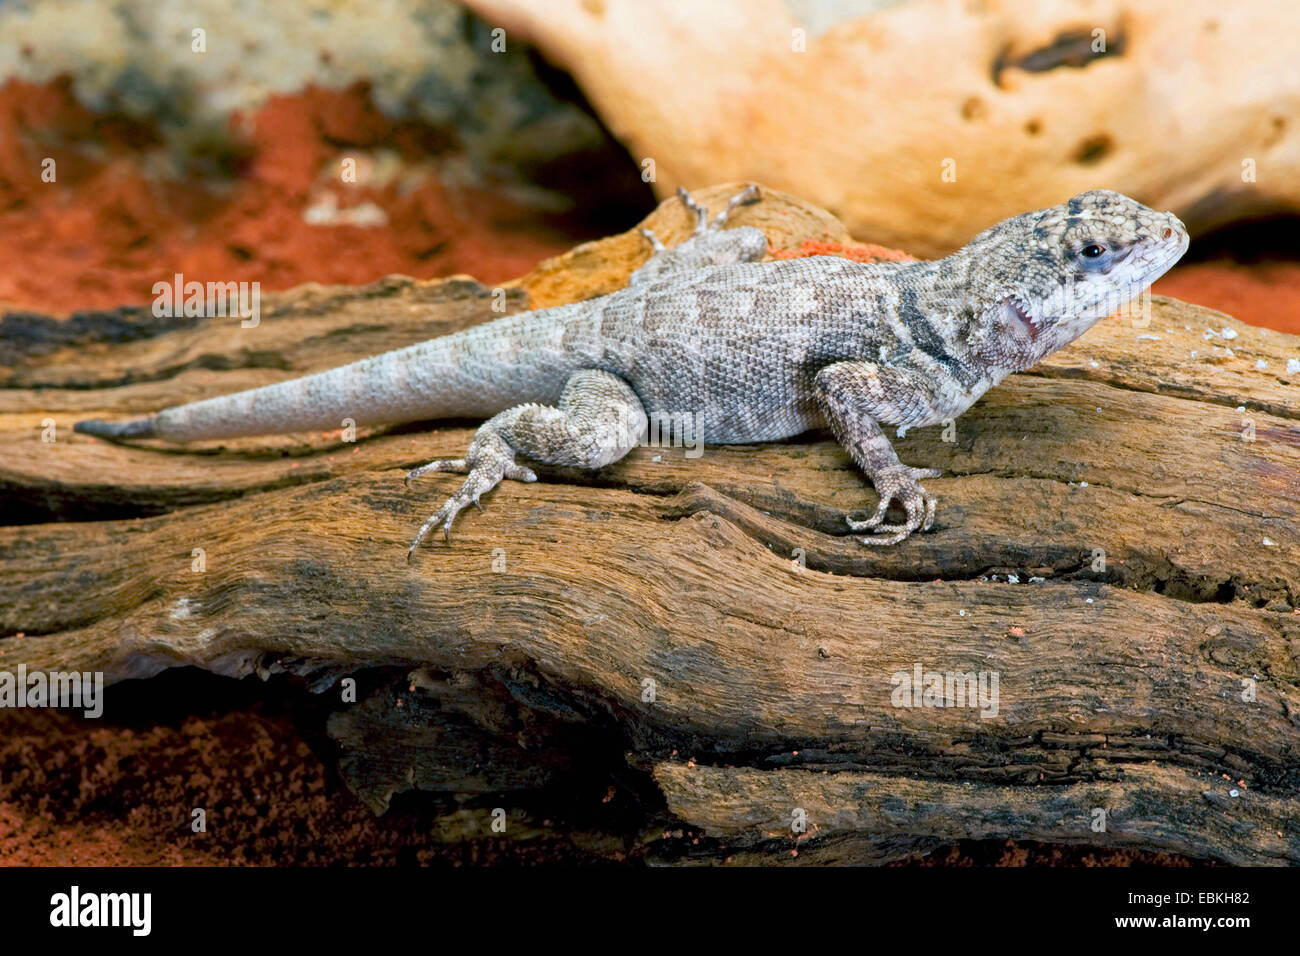 Amazon Lava Lizard (Tropidurus torquatus), assis sur le bois mort Photo Stock